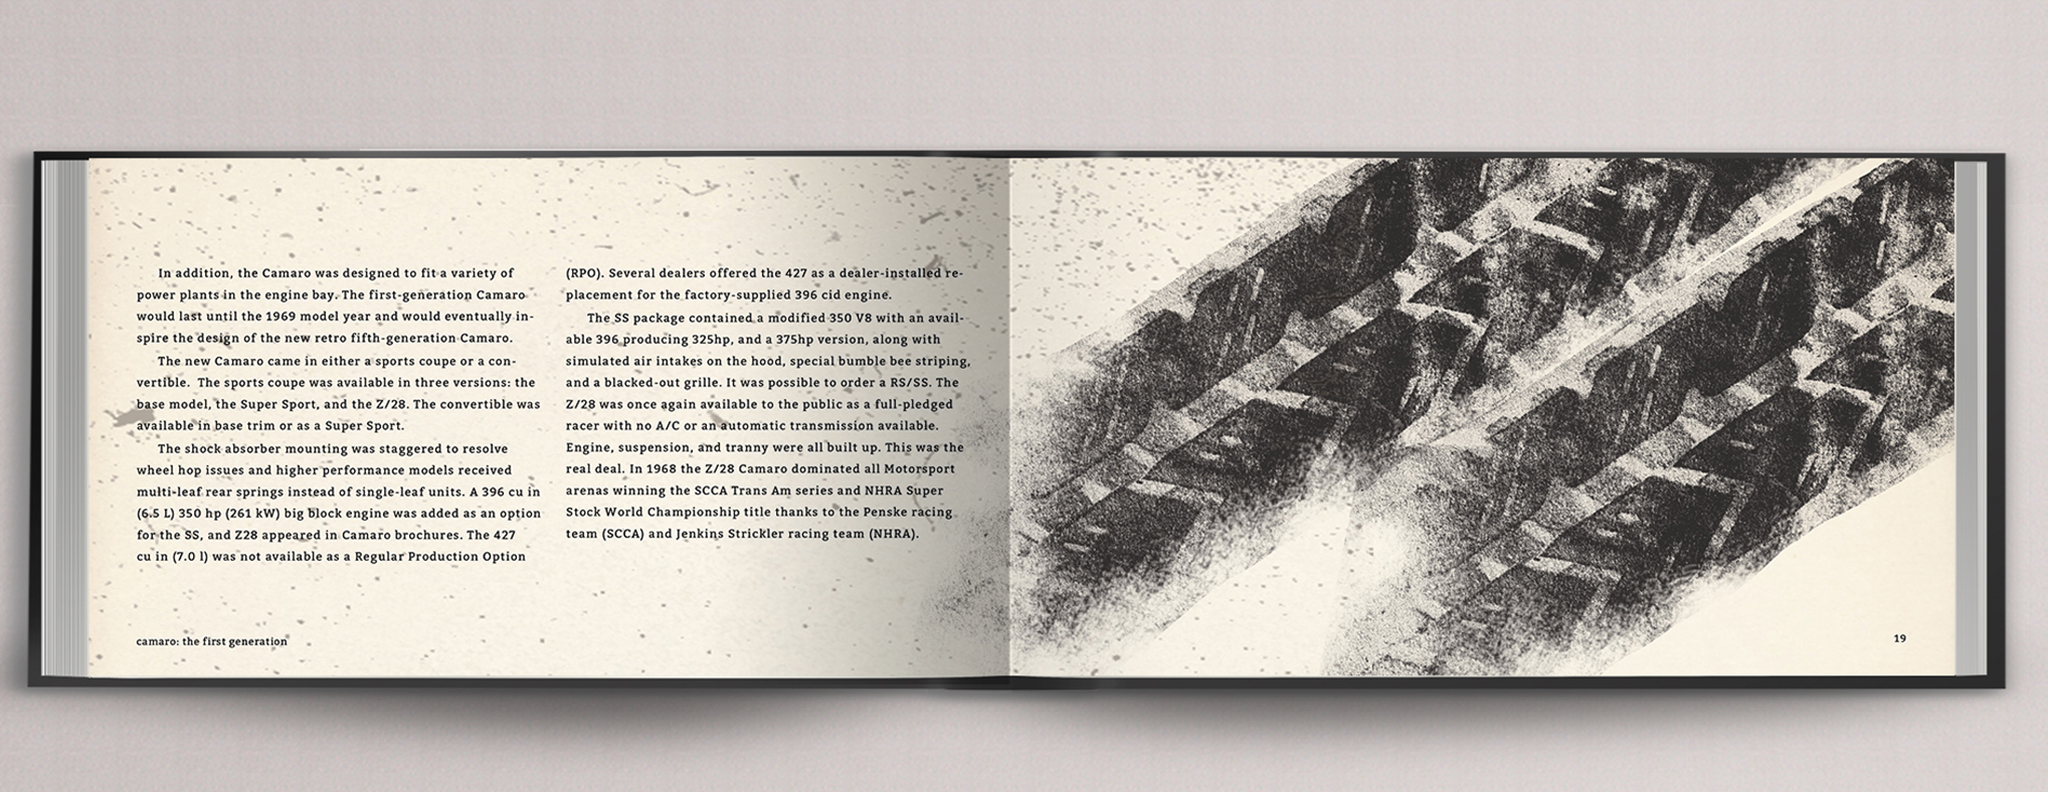 p 13.jpg